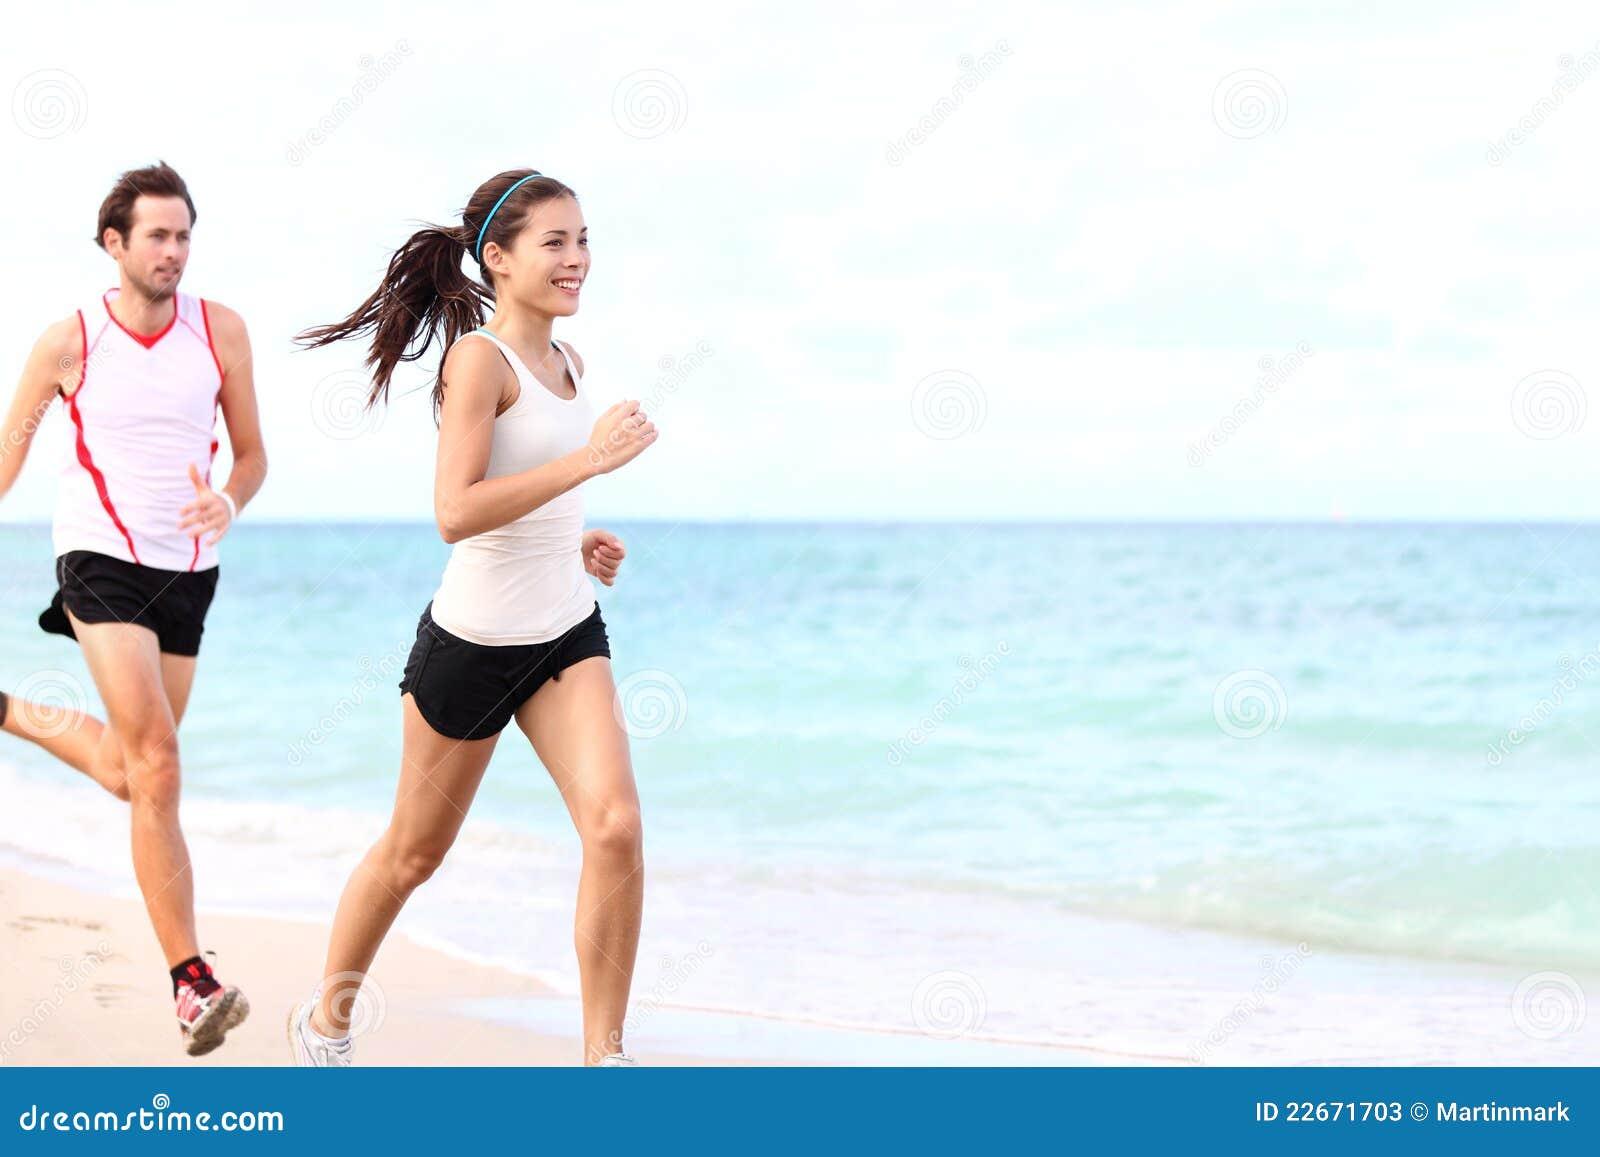 Sport - parrunning